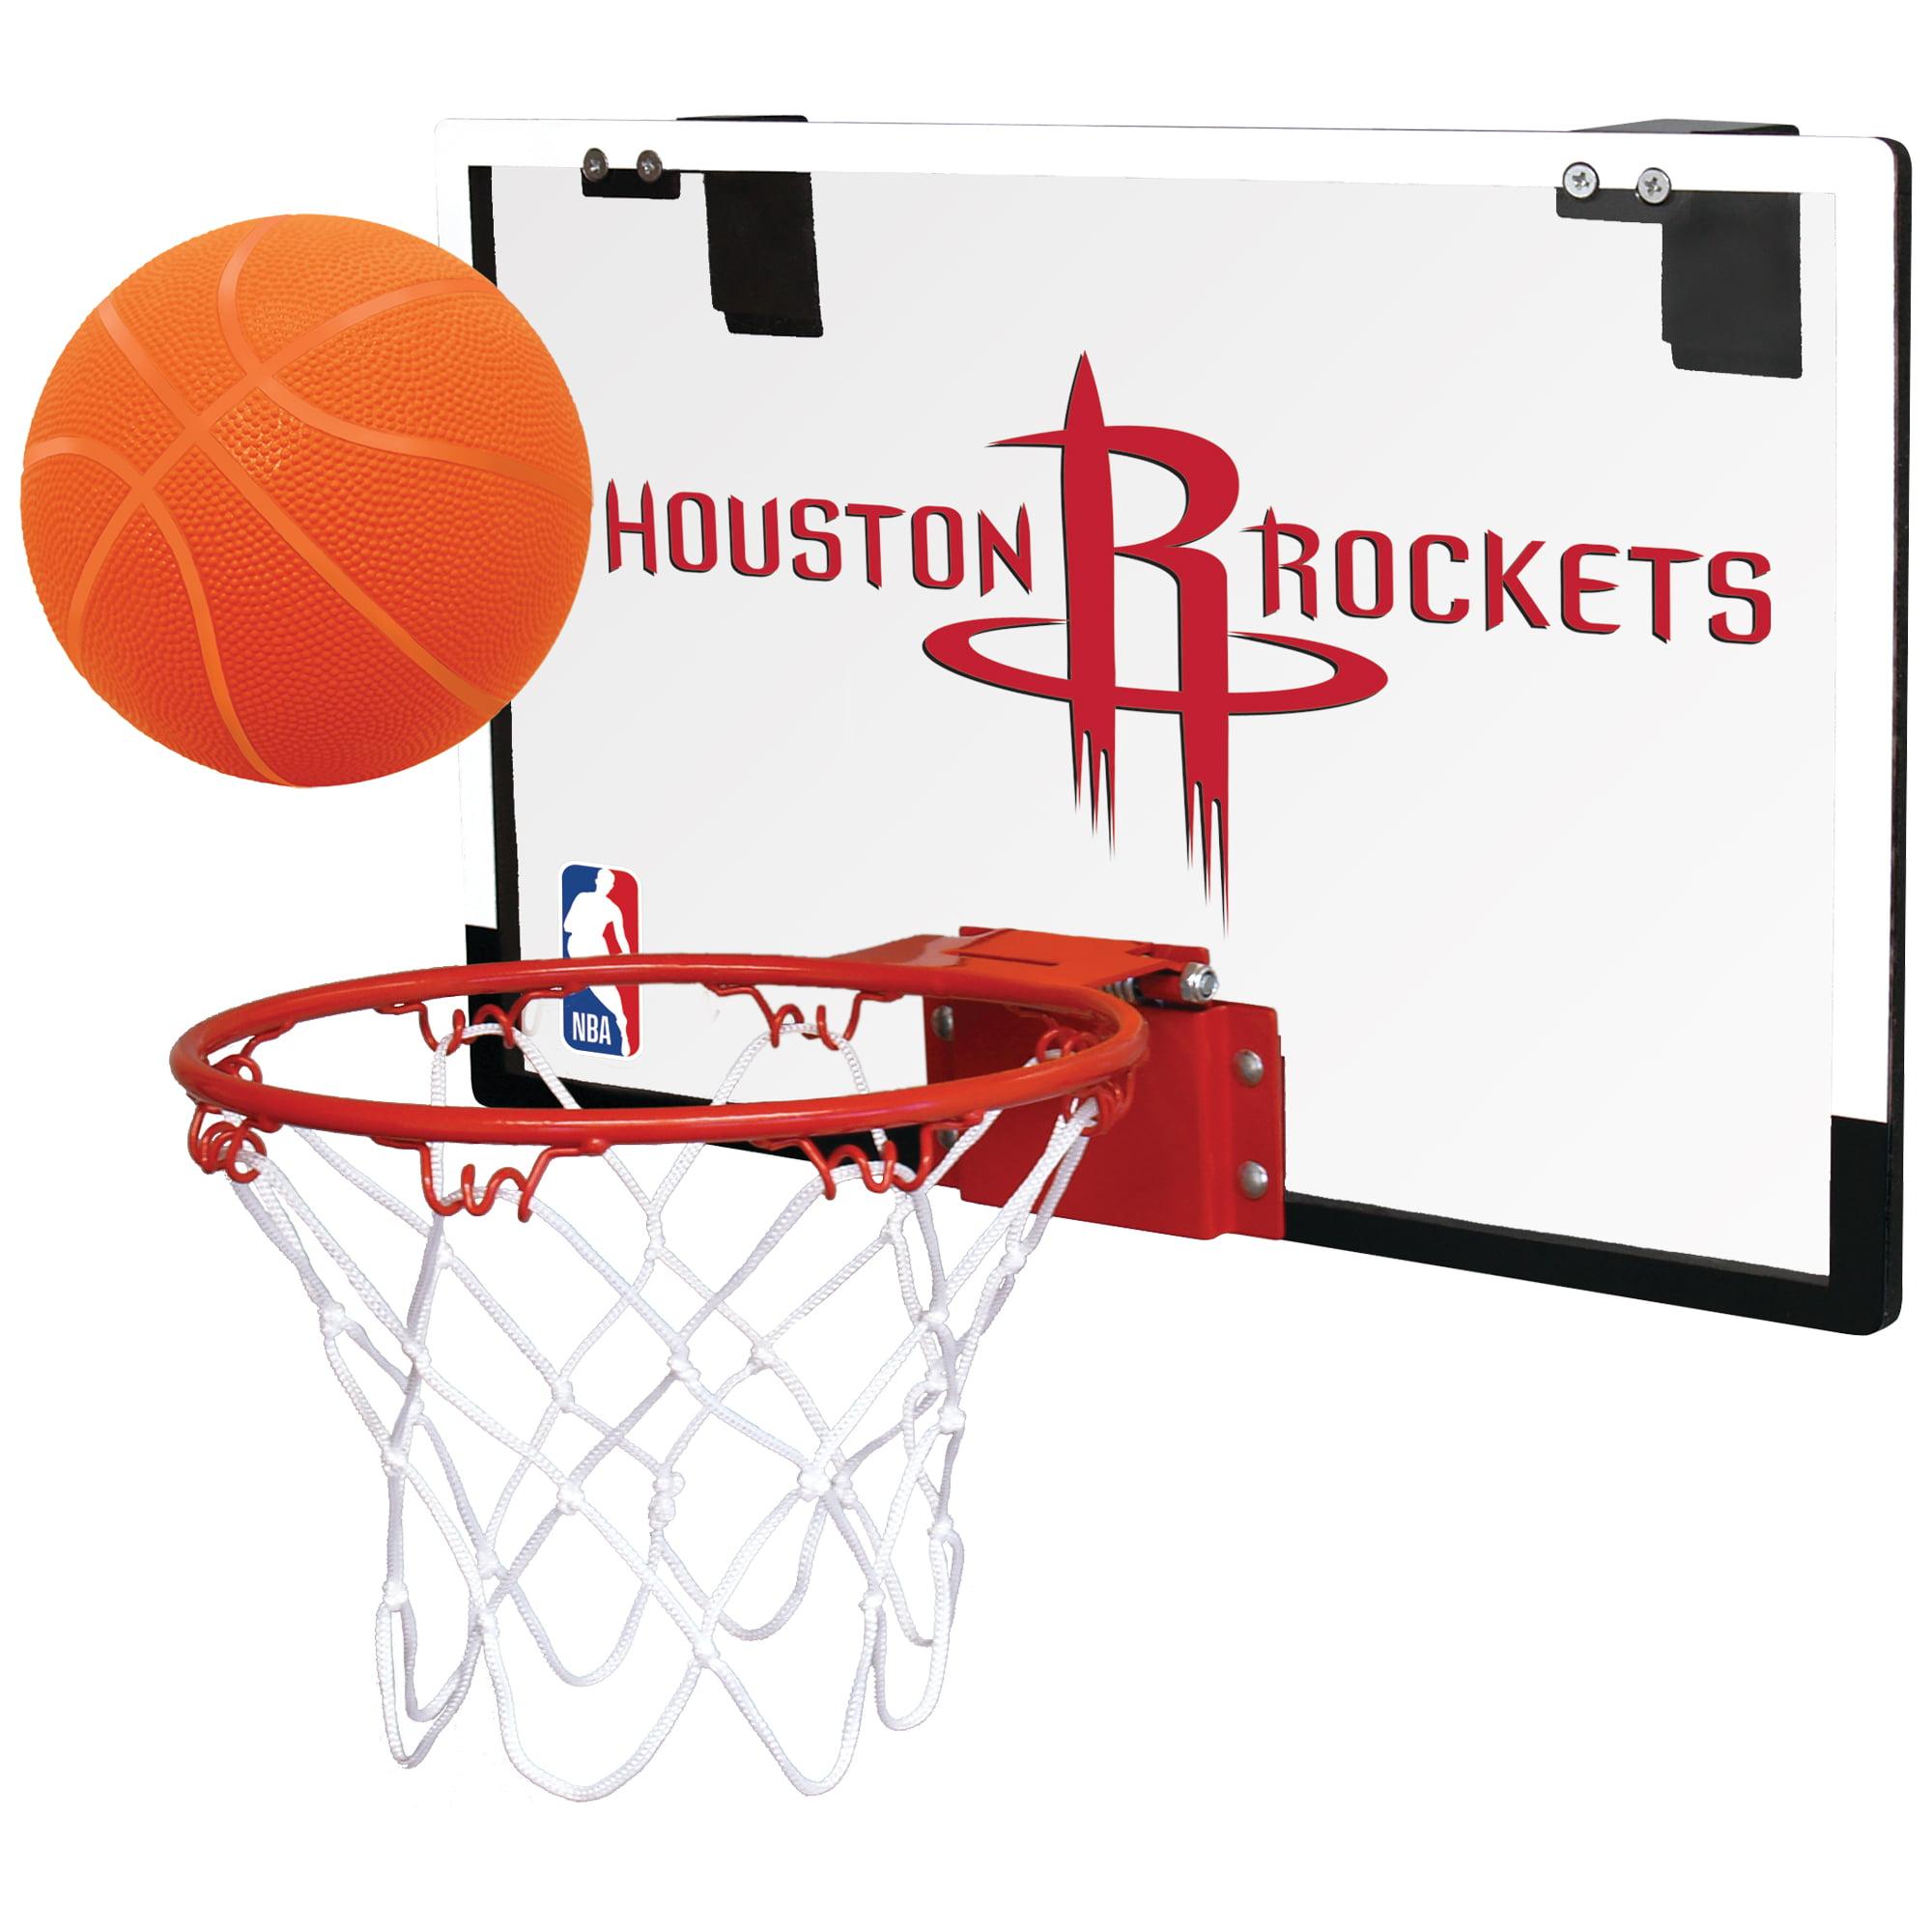 Rawlings NBA Game On Basketball Hoop Set, Houston Rockets by Rawlings